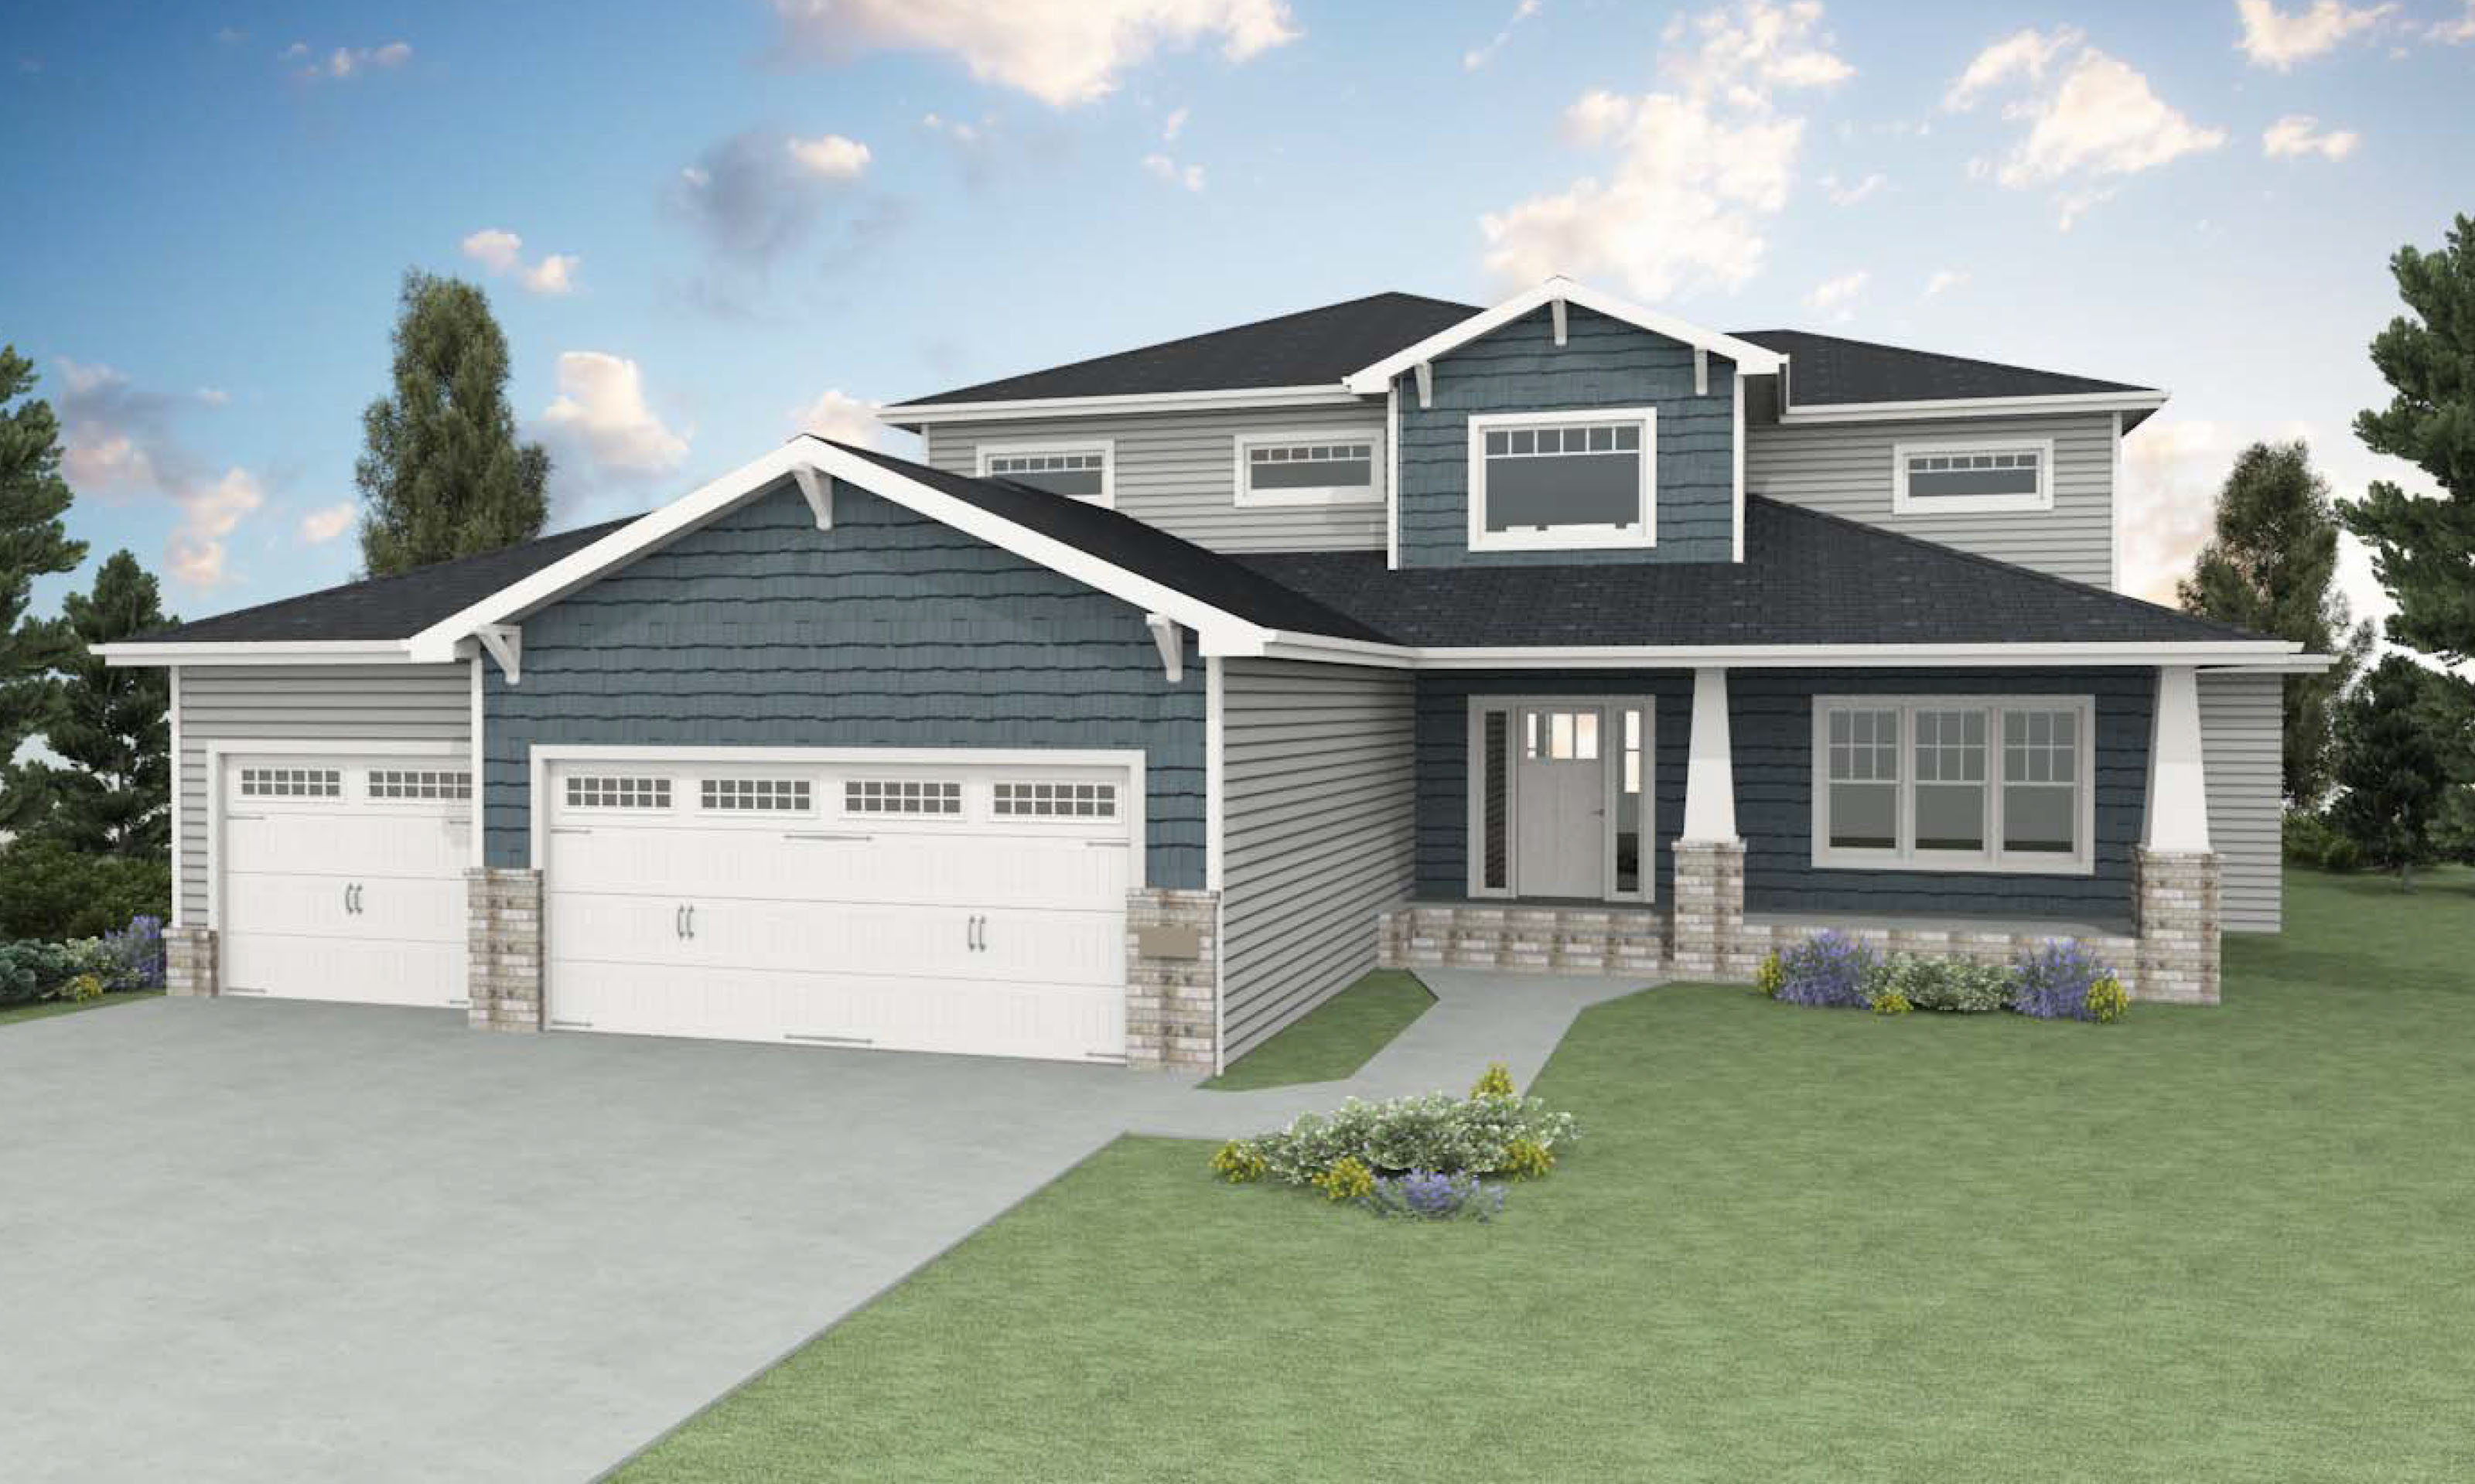 Heritage homes fargo moorhead custom home builder for Fargo nd home builders